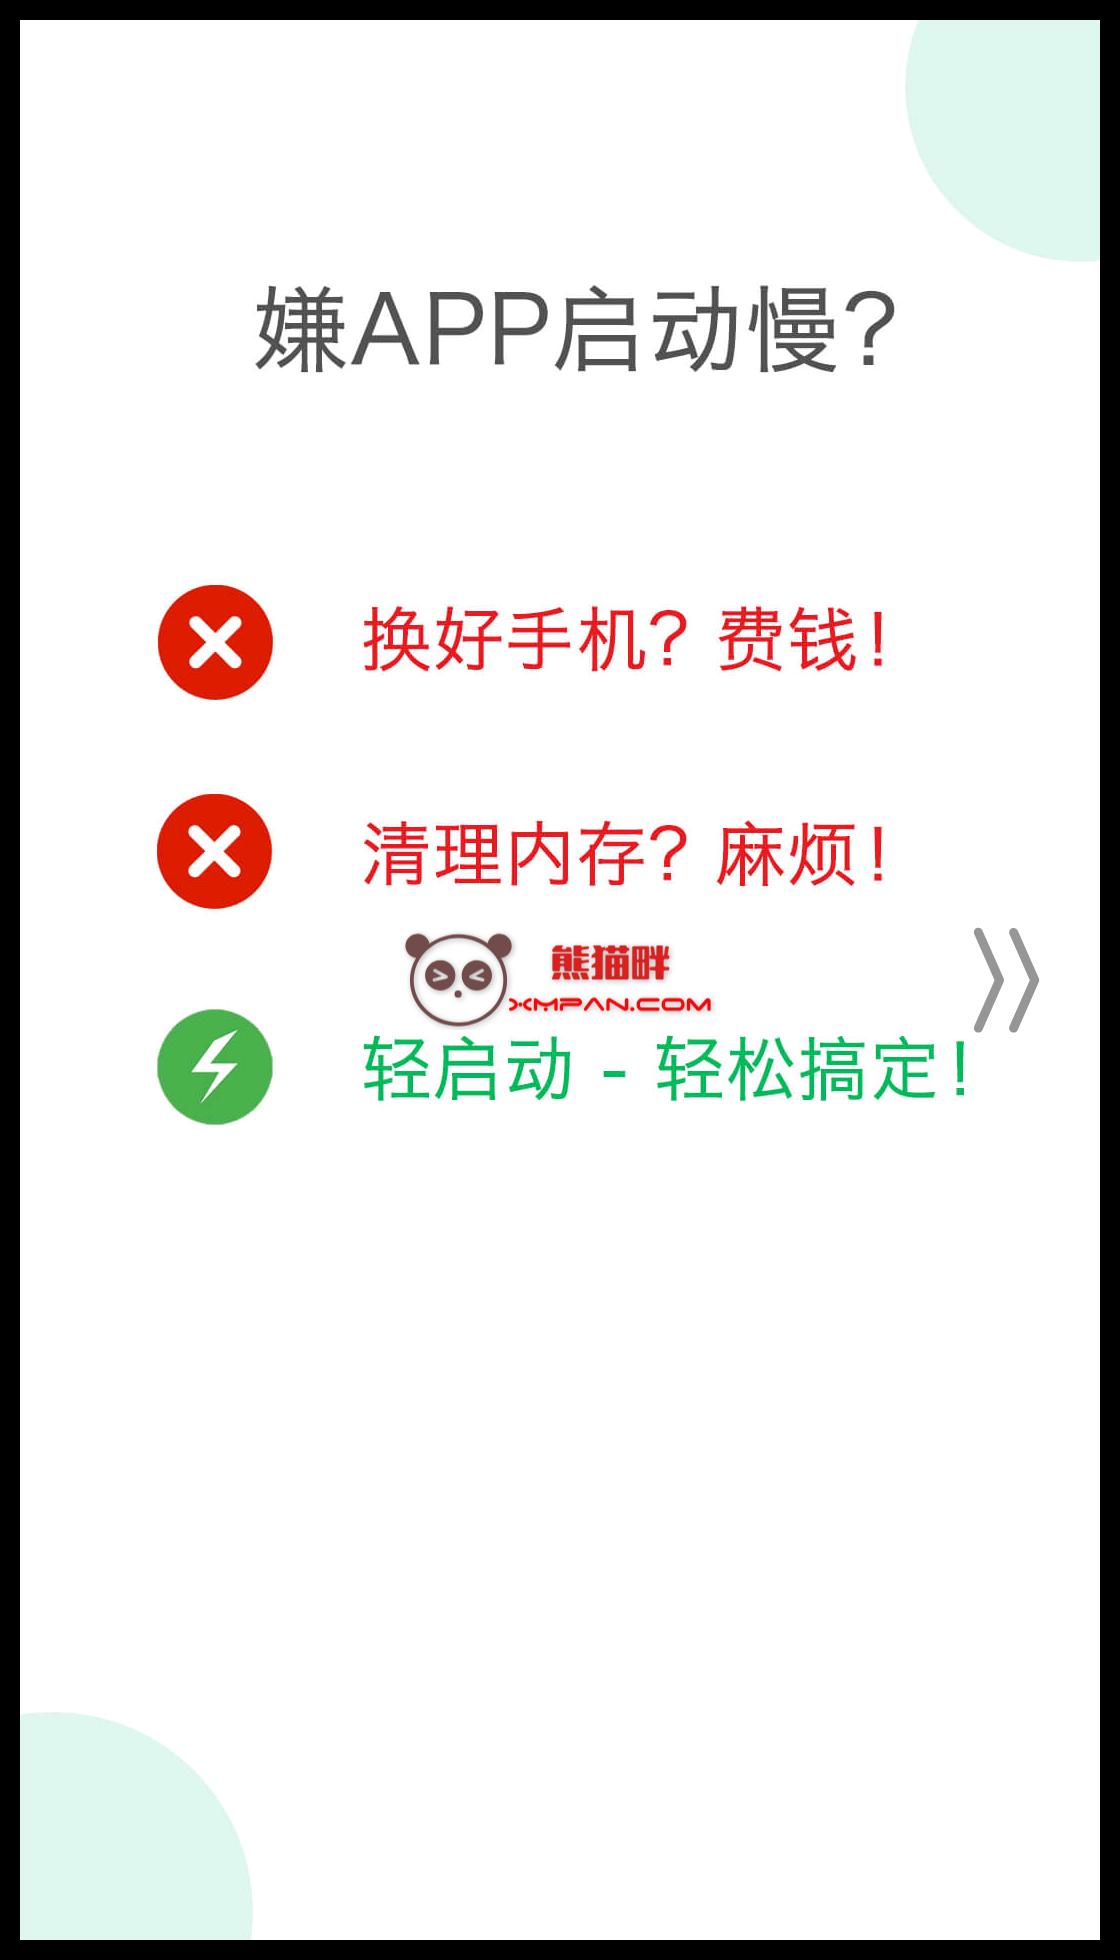 Android 轻启动 v2.17.1 绿色版